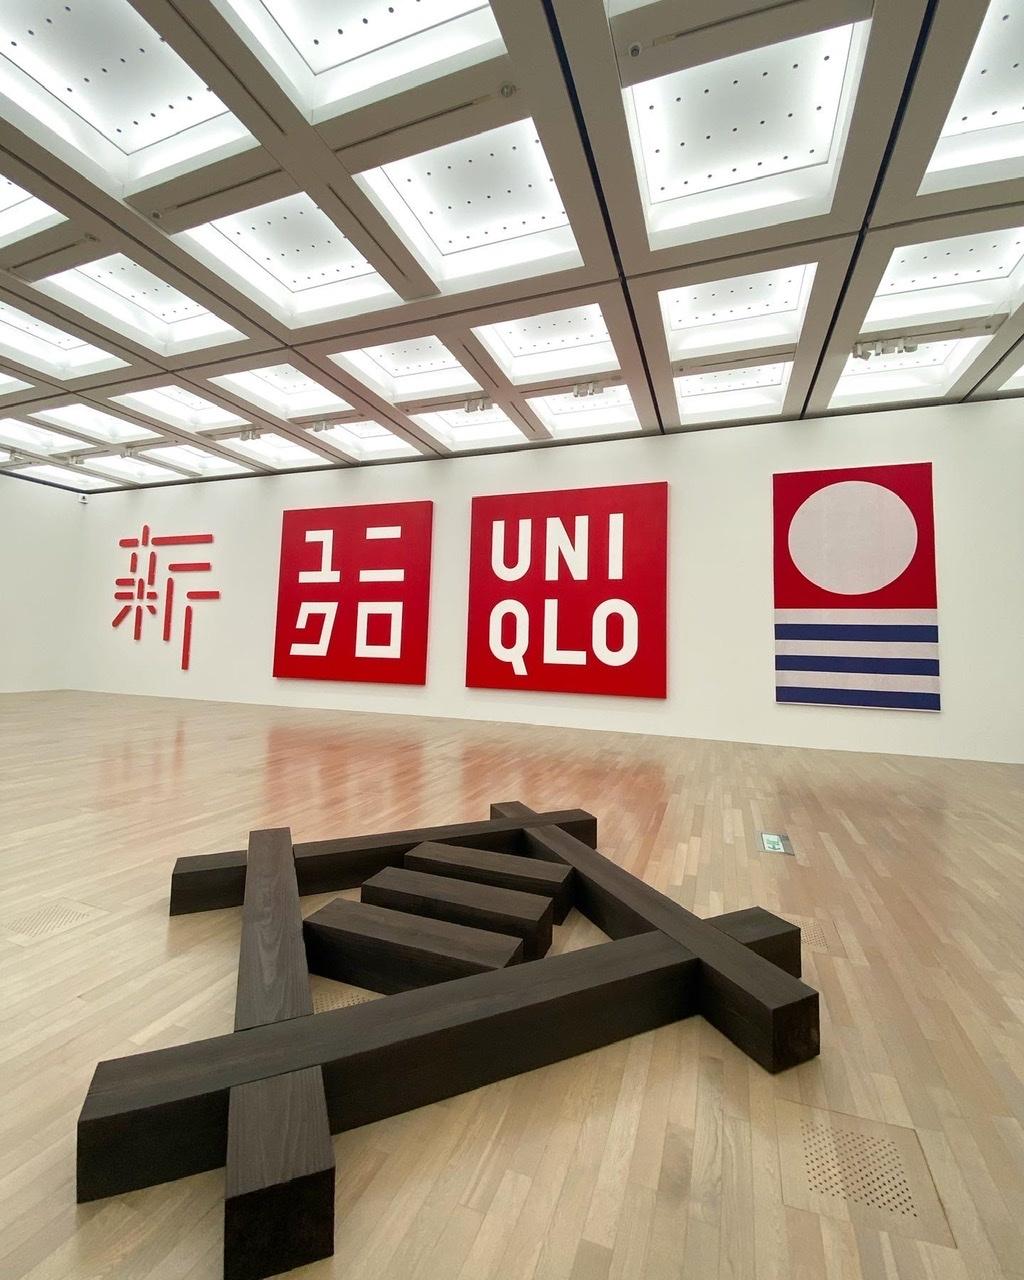 新国立美術館で開催中★佐藤可士和展へ_1_4-1